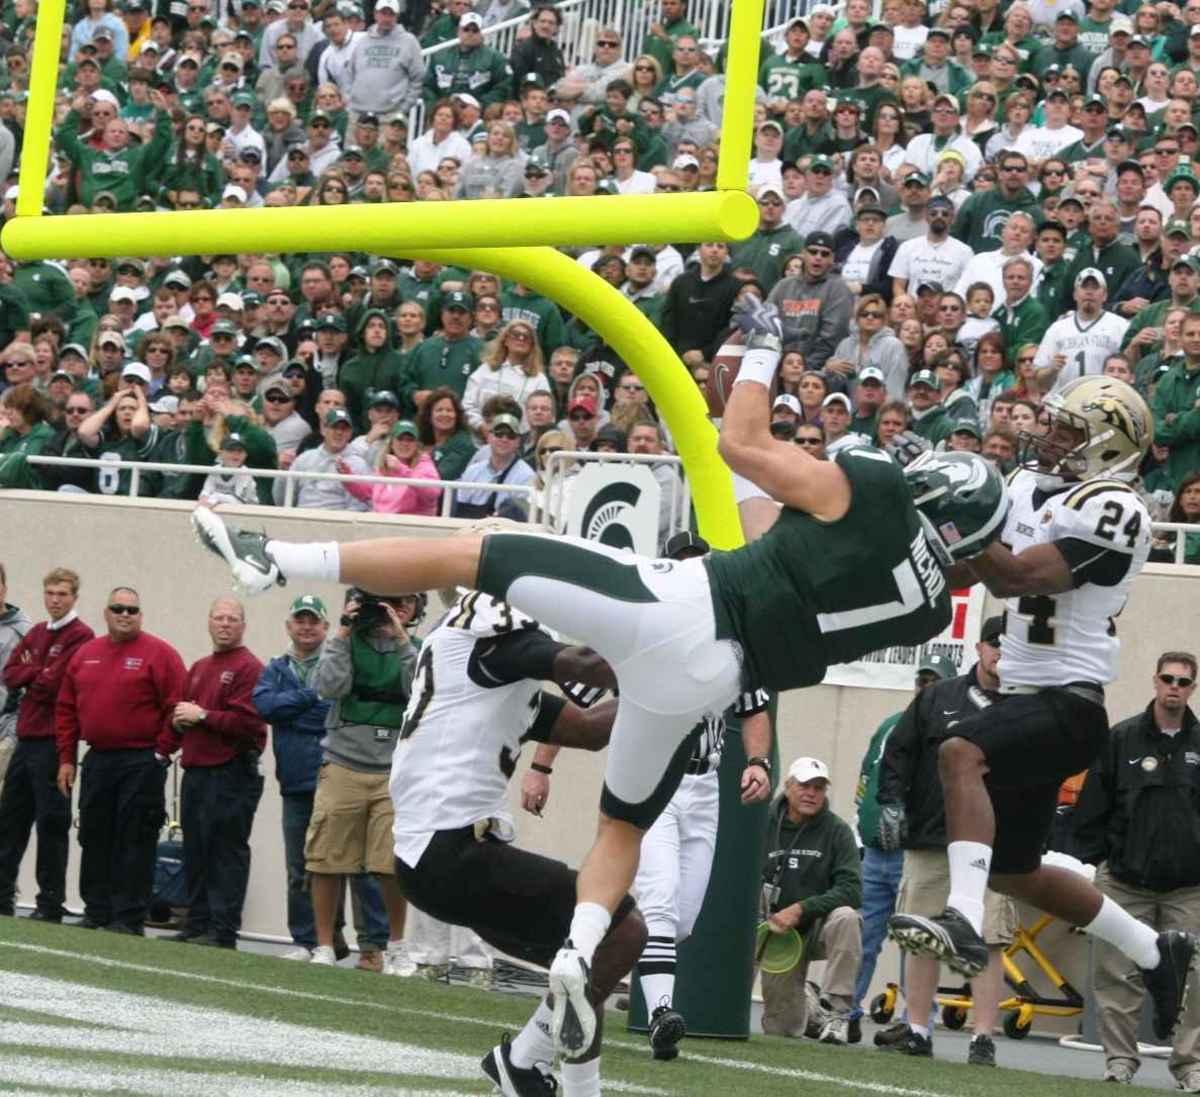 Keith Nichol's amazing TD catch set the stage for an amazing 2010 season.  Photo courtesy of Bill Marklevits.